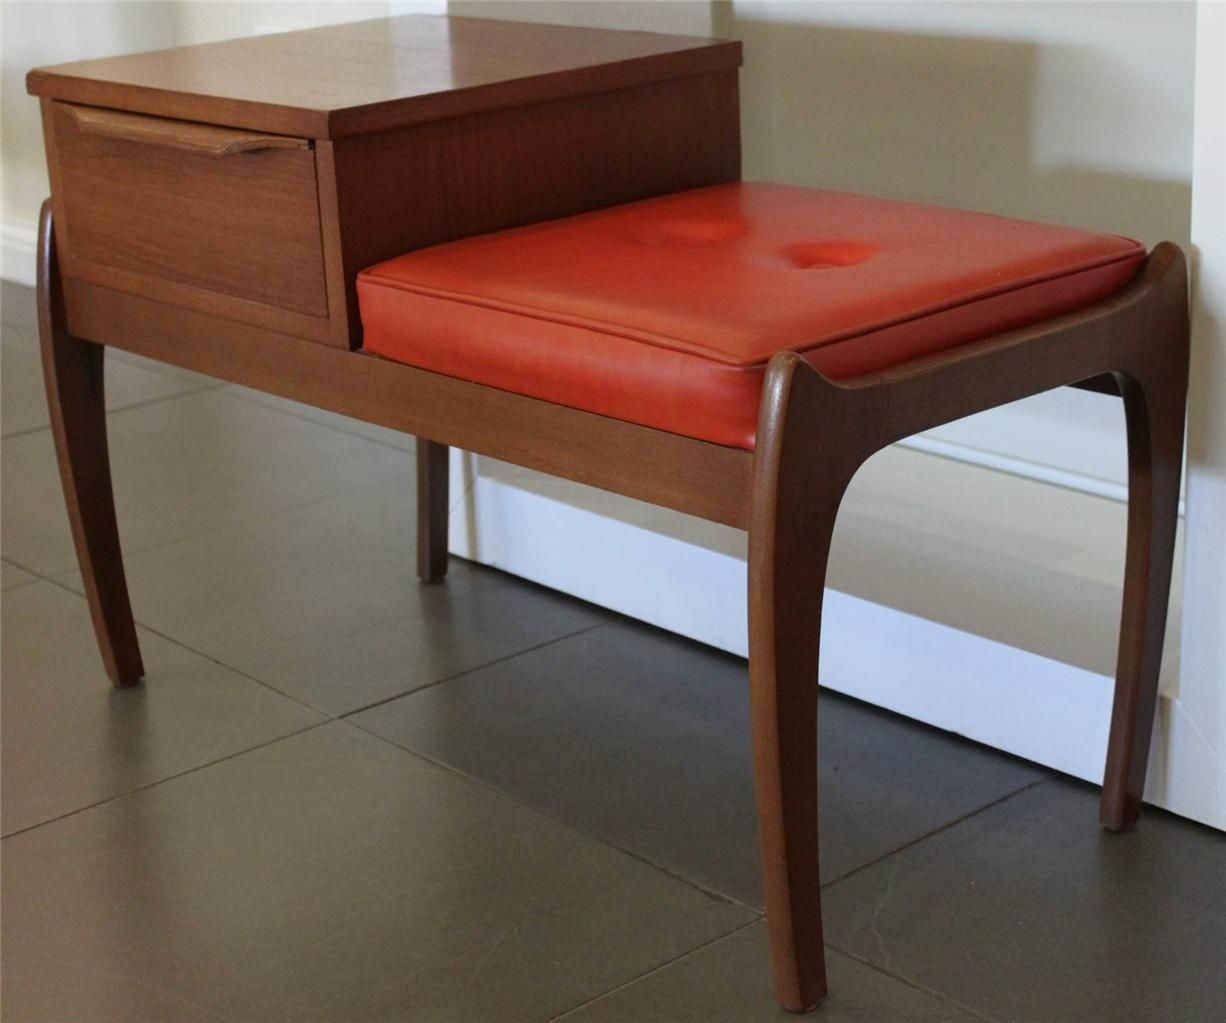 60s Style Furniture vintage retro 60's danish style teak telephone table eames era mid